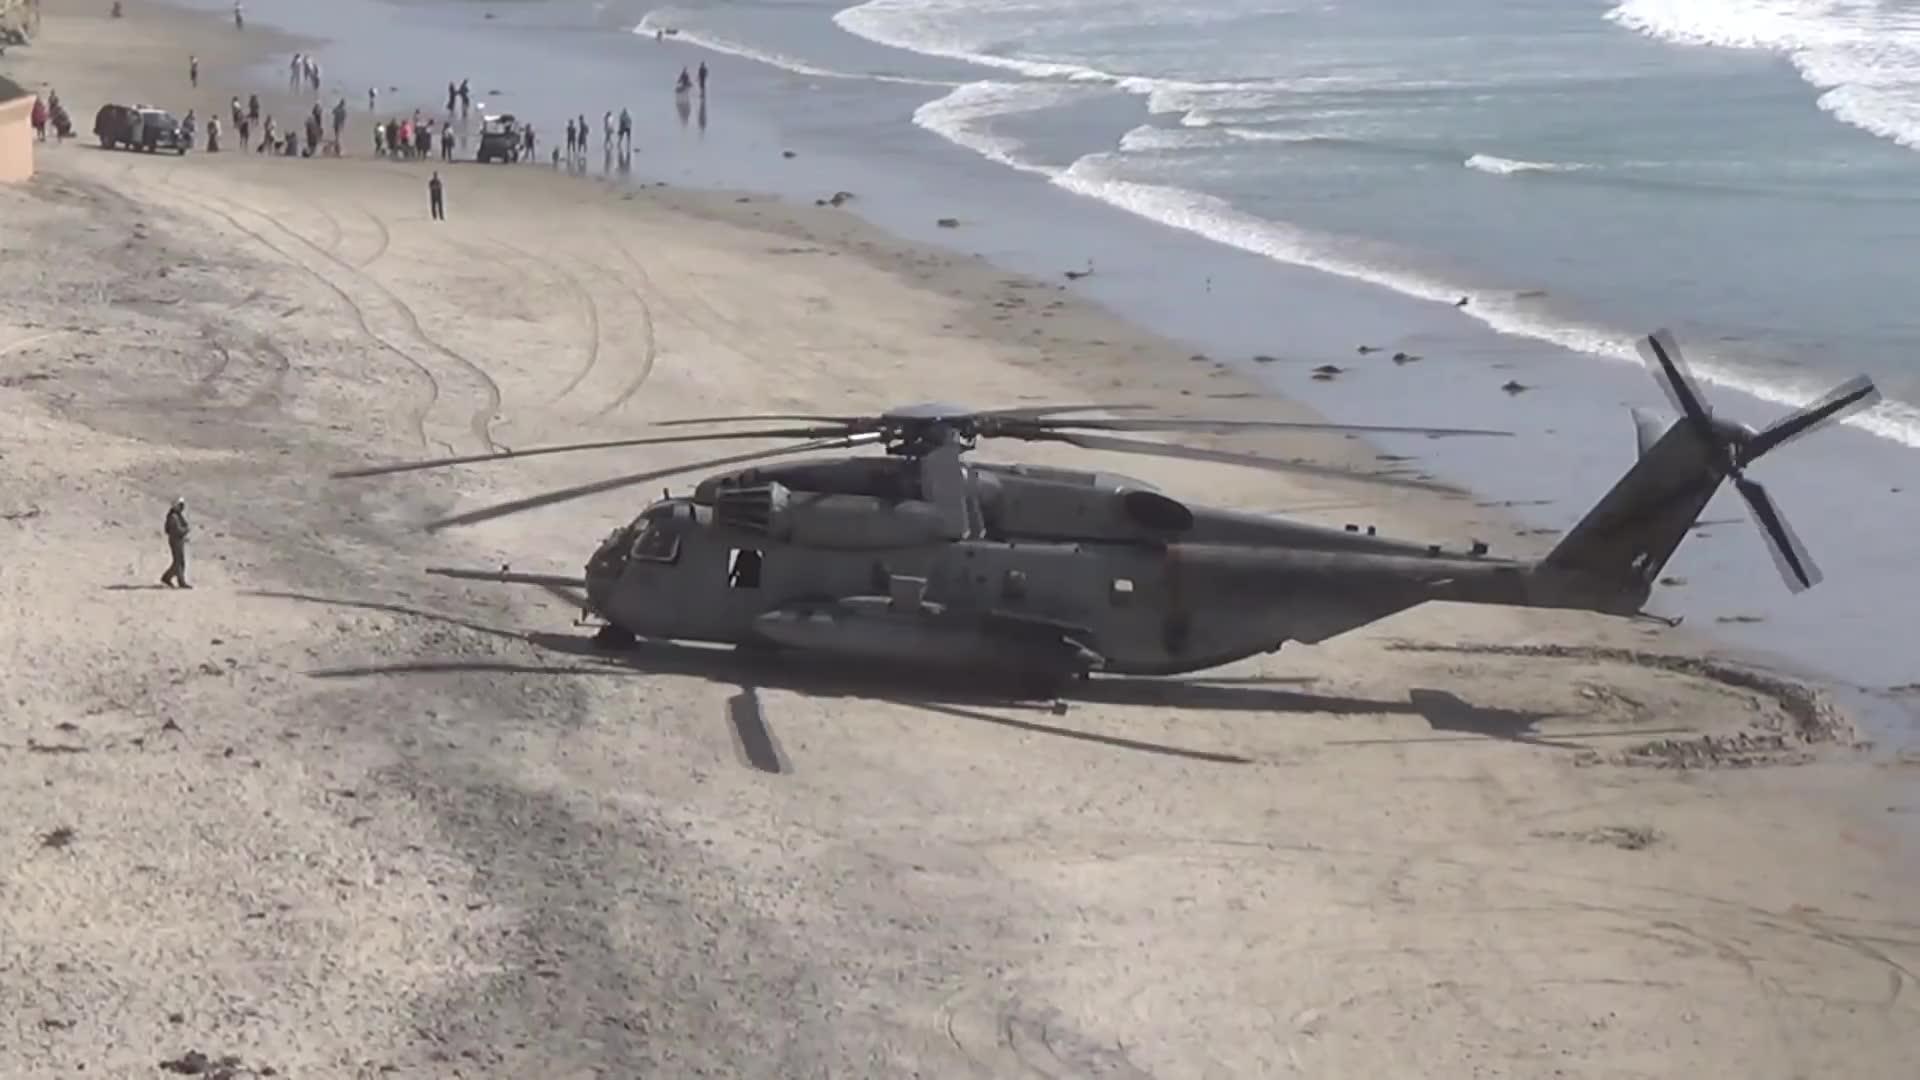 ch 53超级种马直升机在海滩起飞